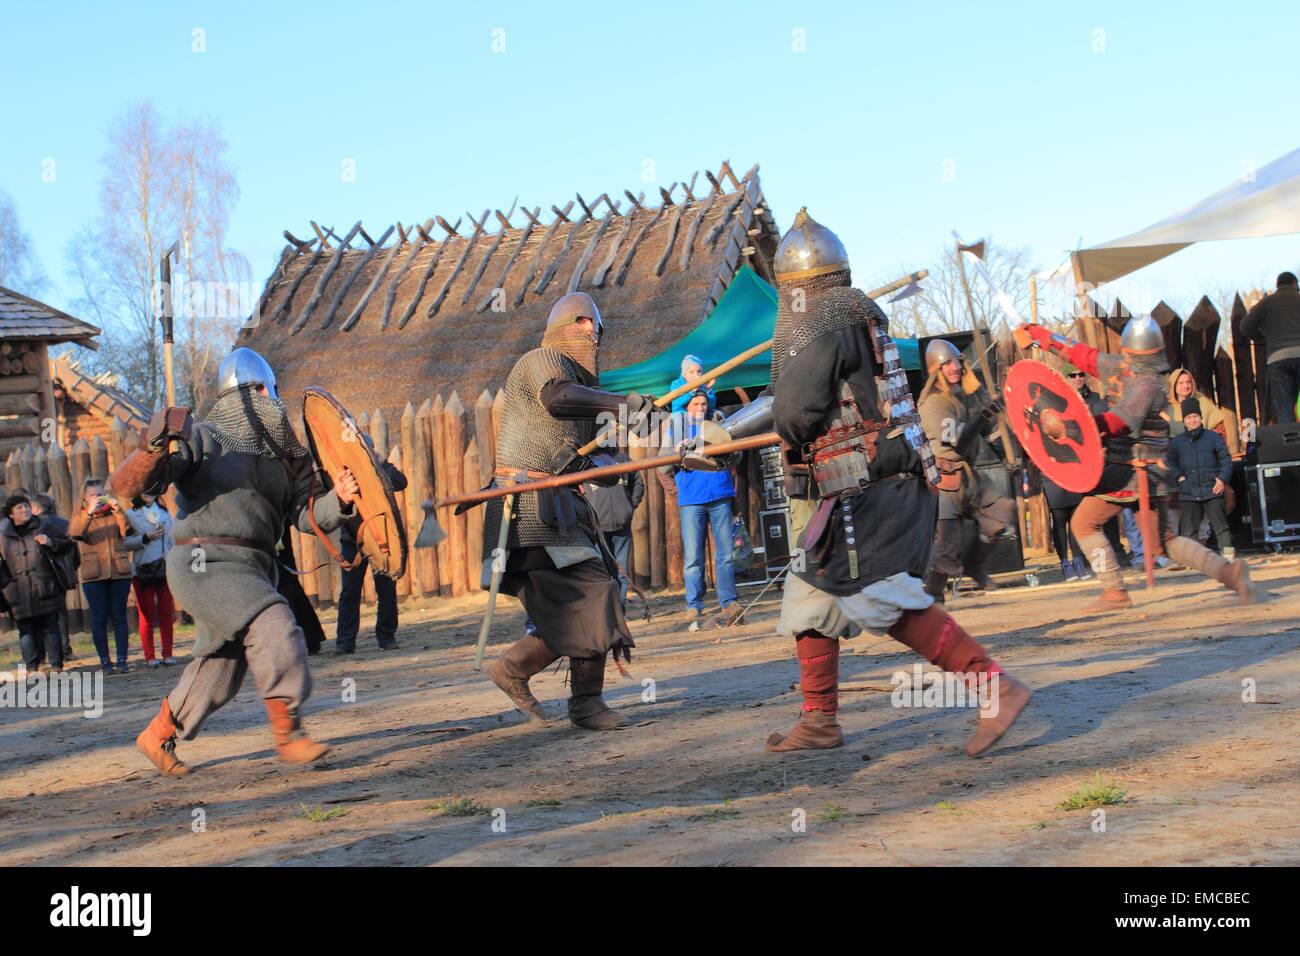 Medieval warriors acting costumed fight for tourist in Slawutowo settlement. Pomerania region, Poland. - Stock Image